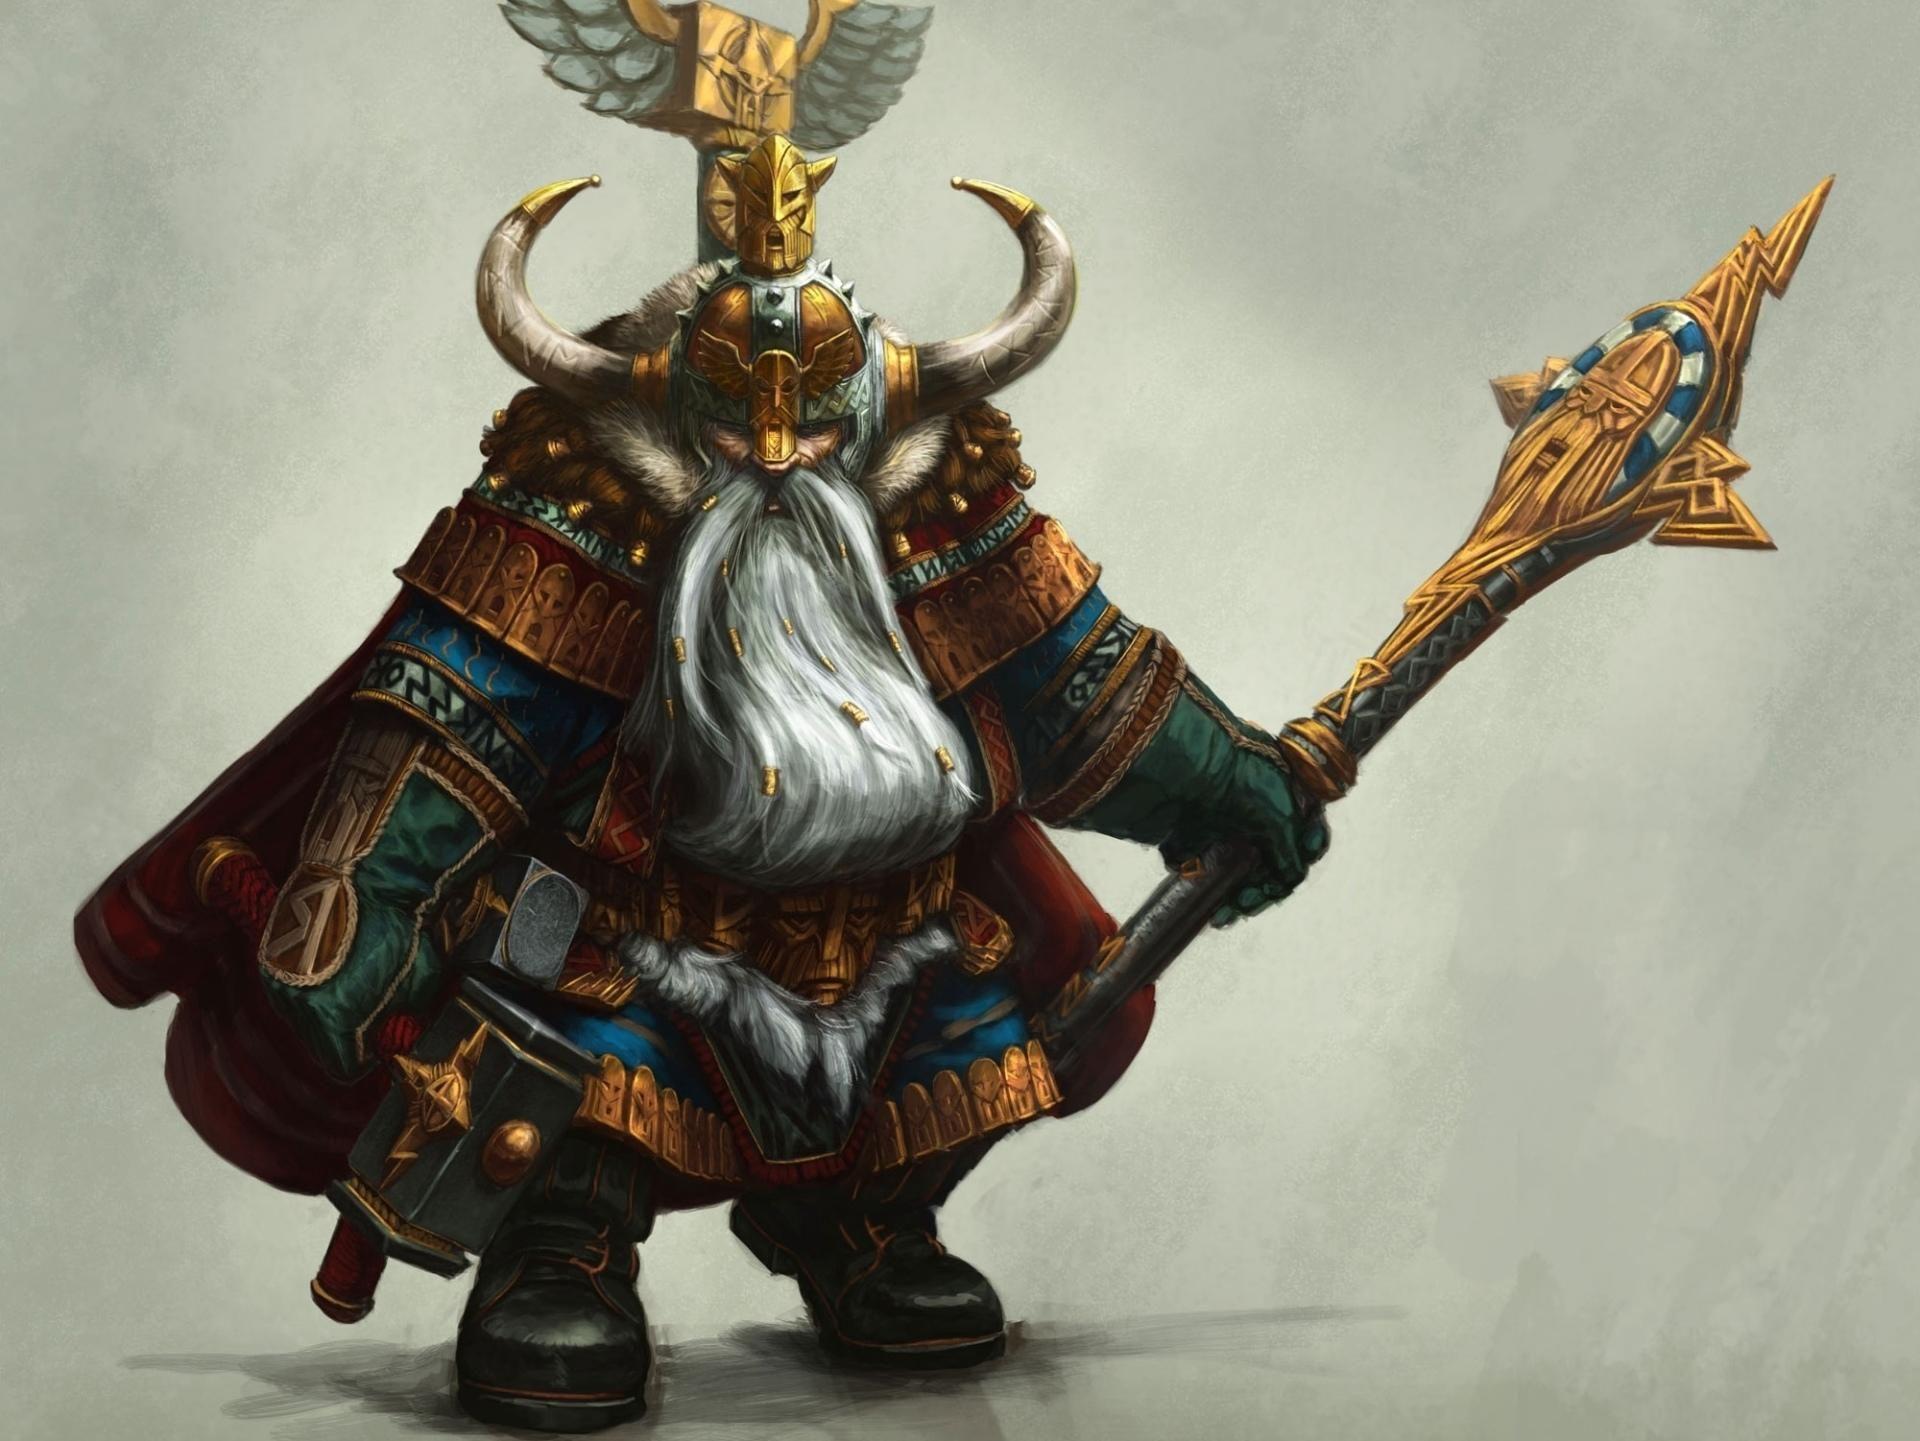 Dwarf Wallpapers Hd Fantasy Dwarf Art Arcane Trickster